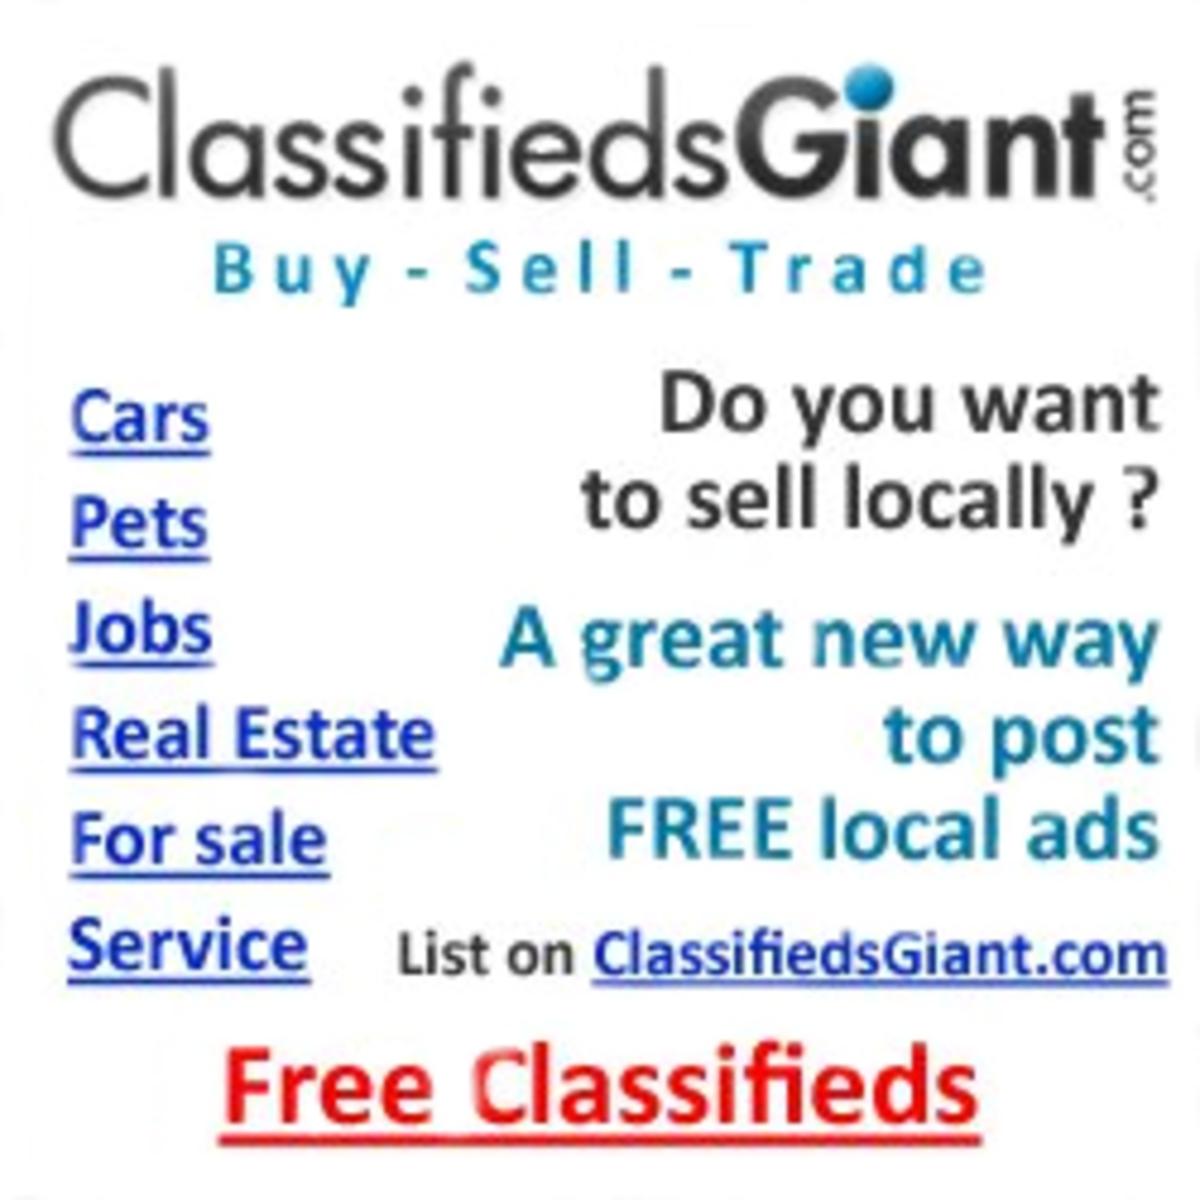 craigslist erotic services alternative № 76647